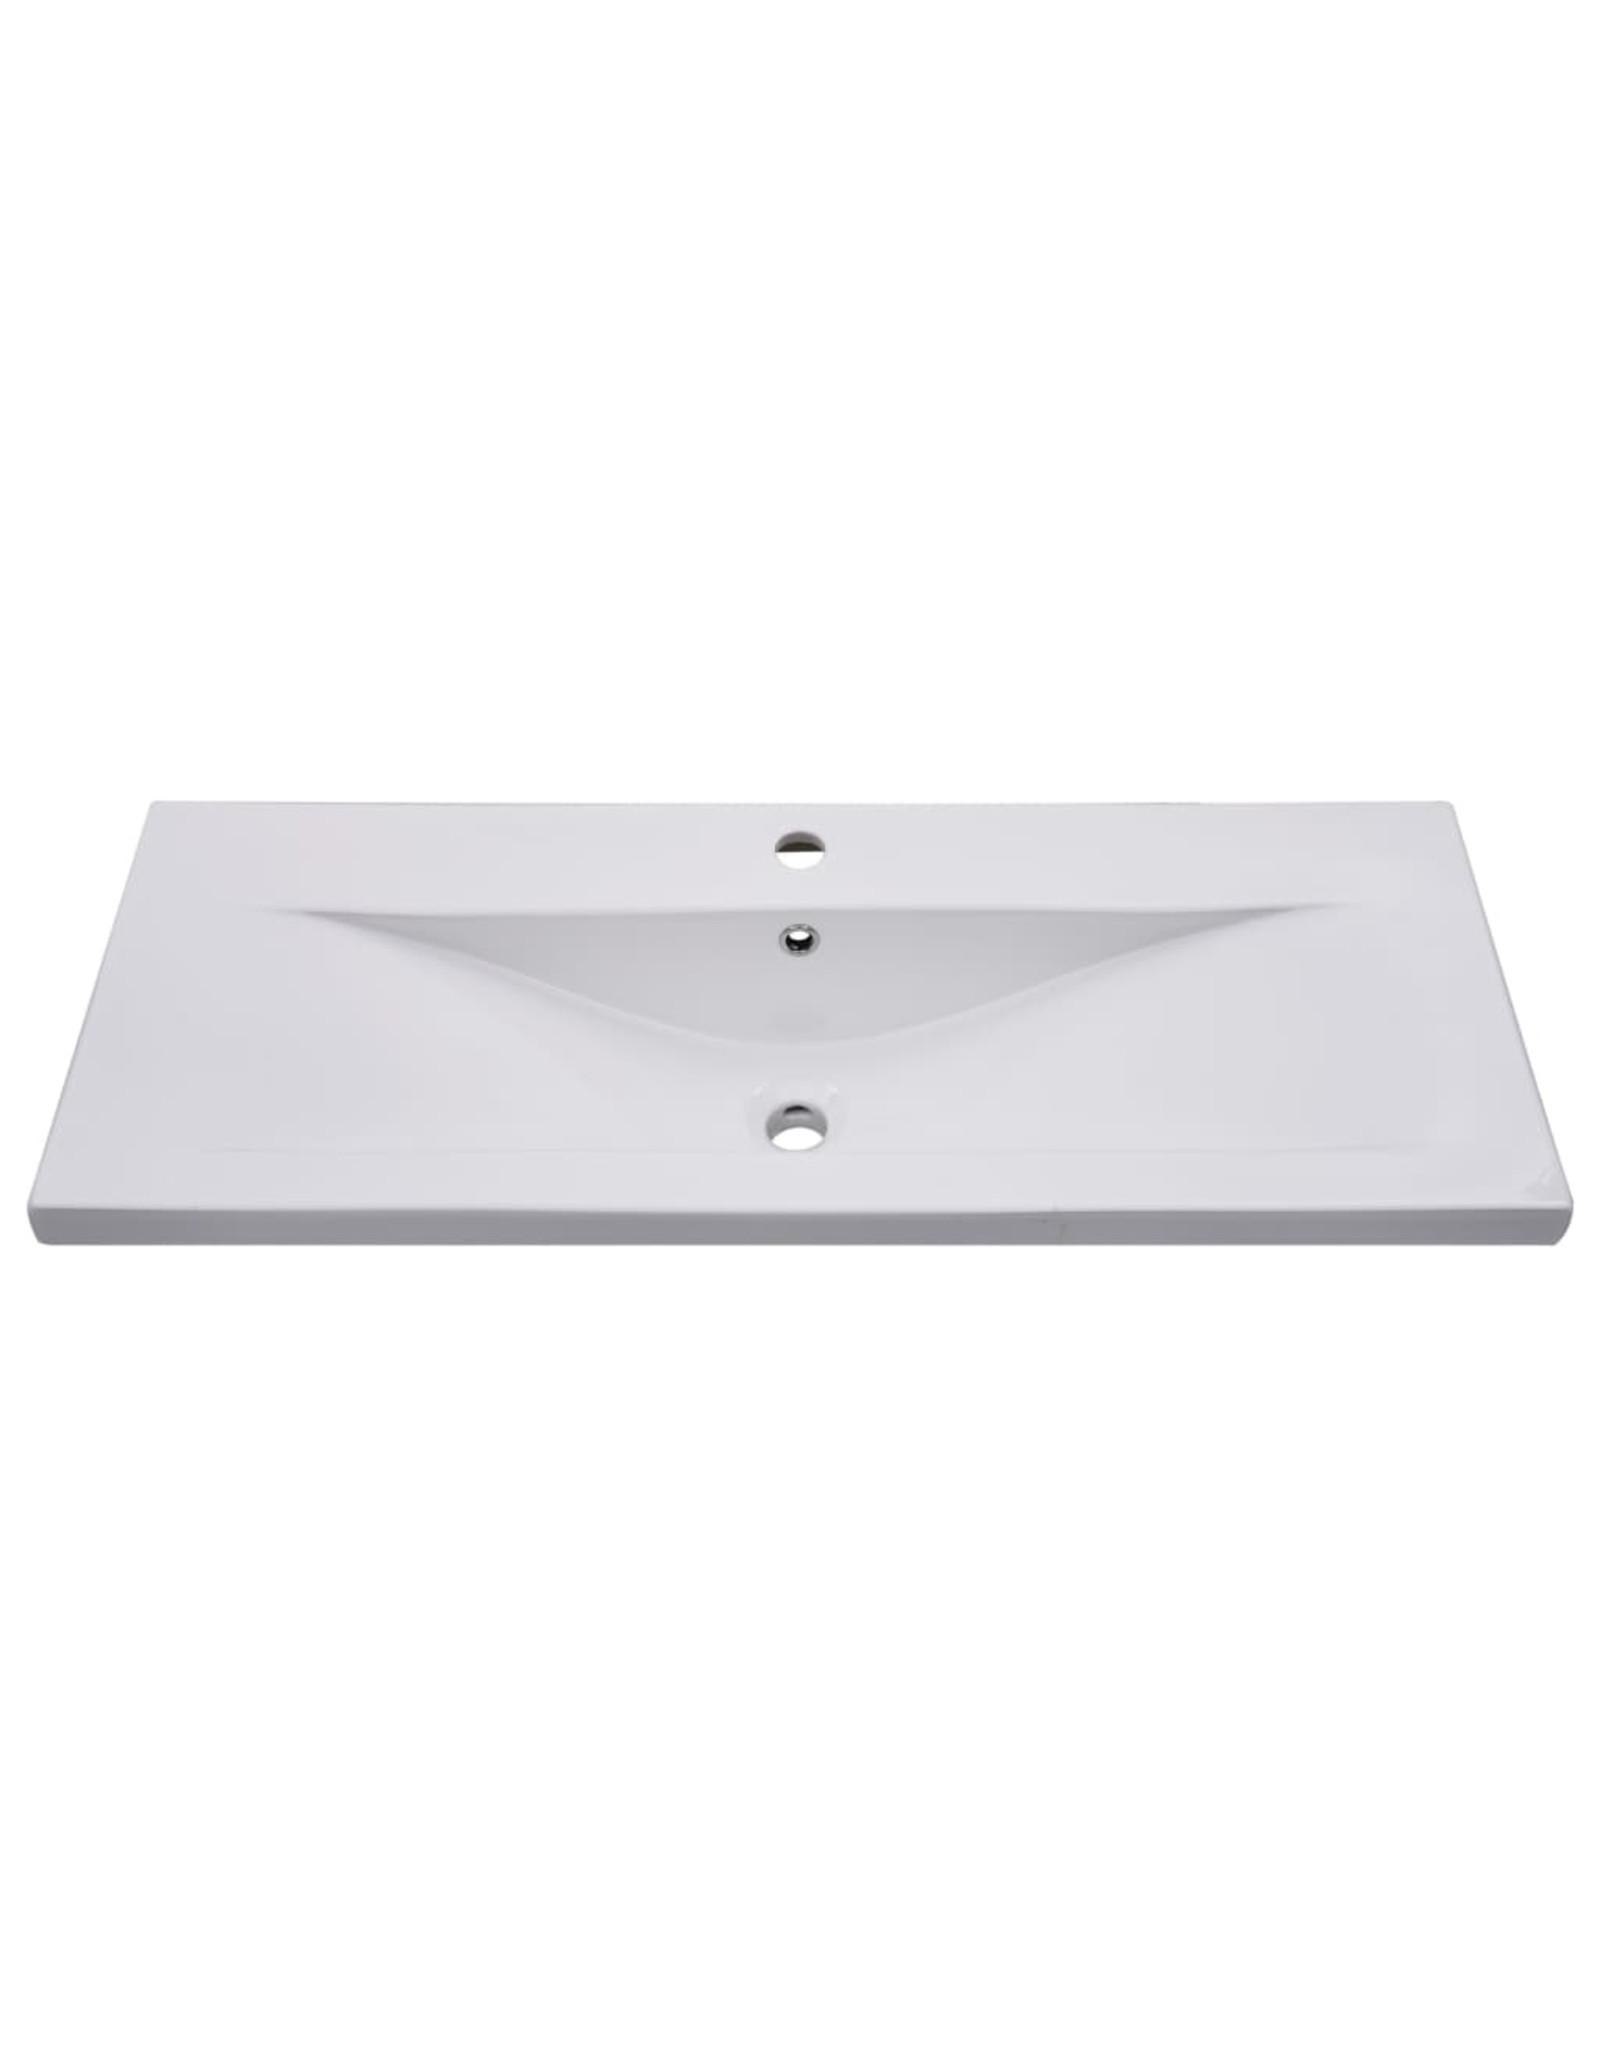 Inbouwwastafel 101x39,5x18,5 cm keramiek wit